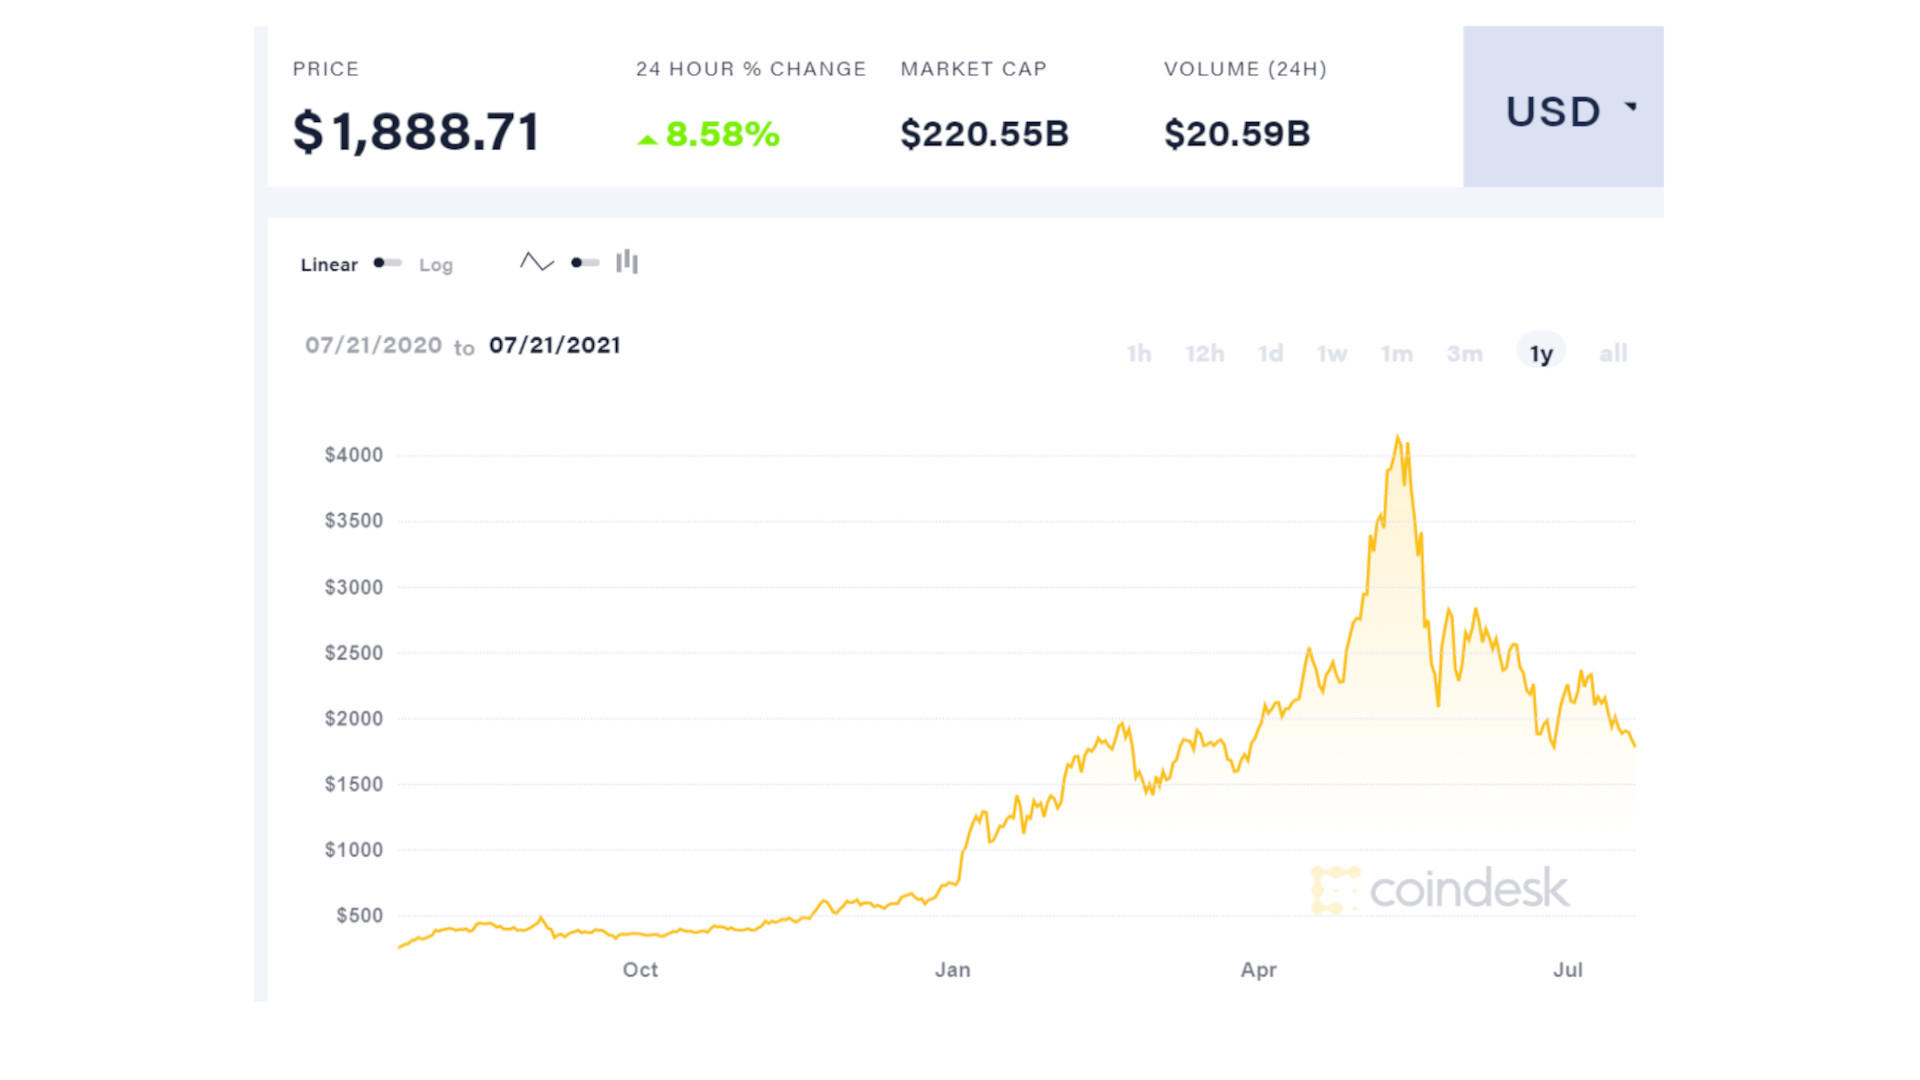 Coindesk showing Ethereum value